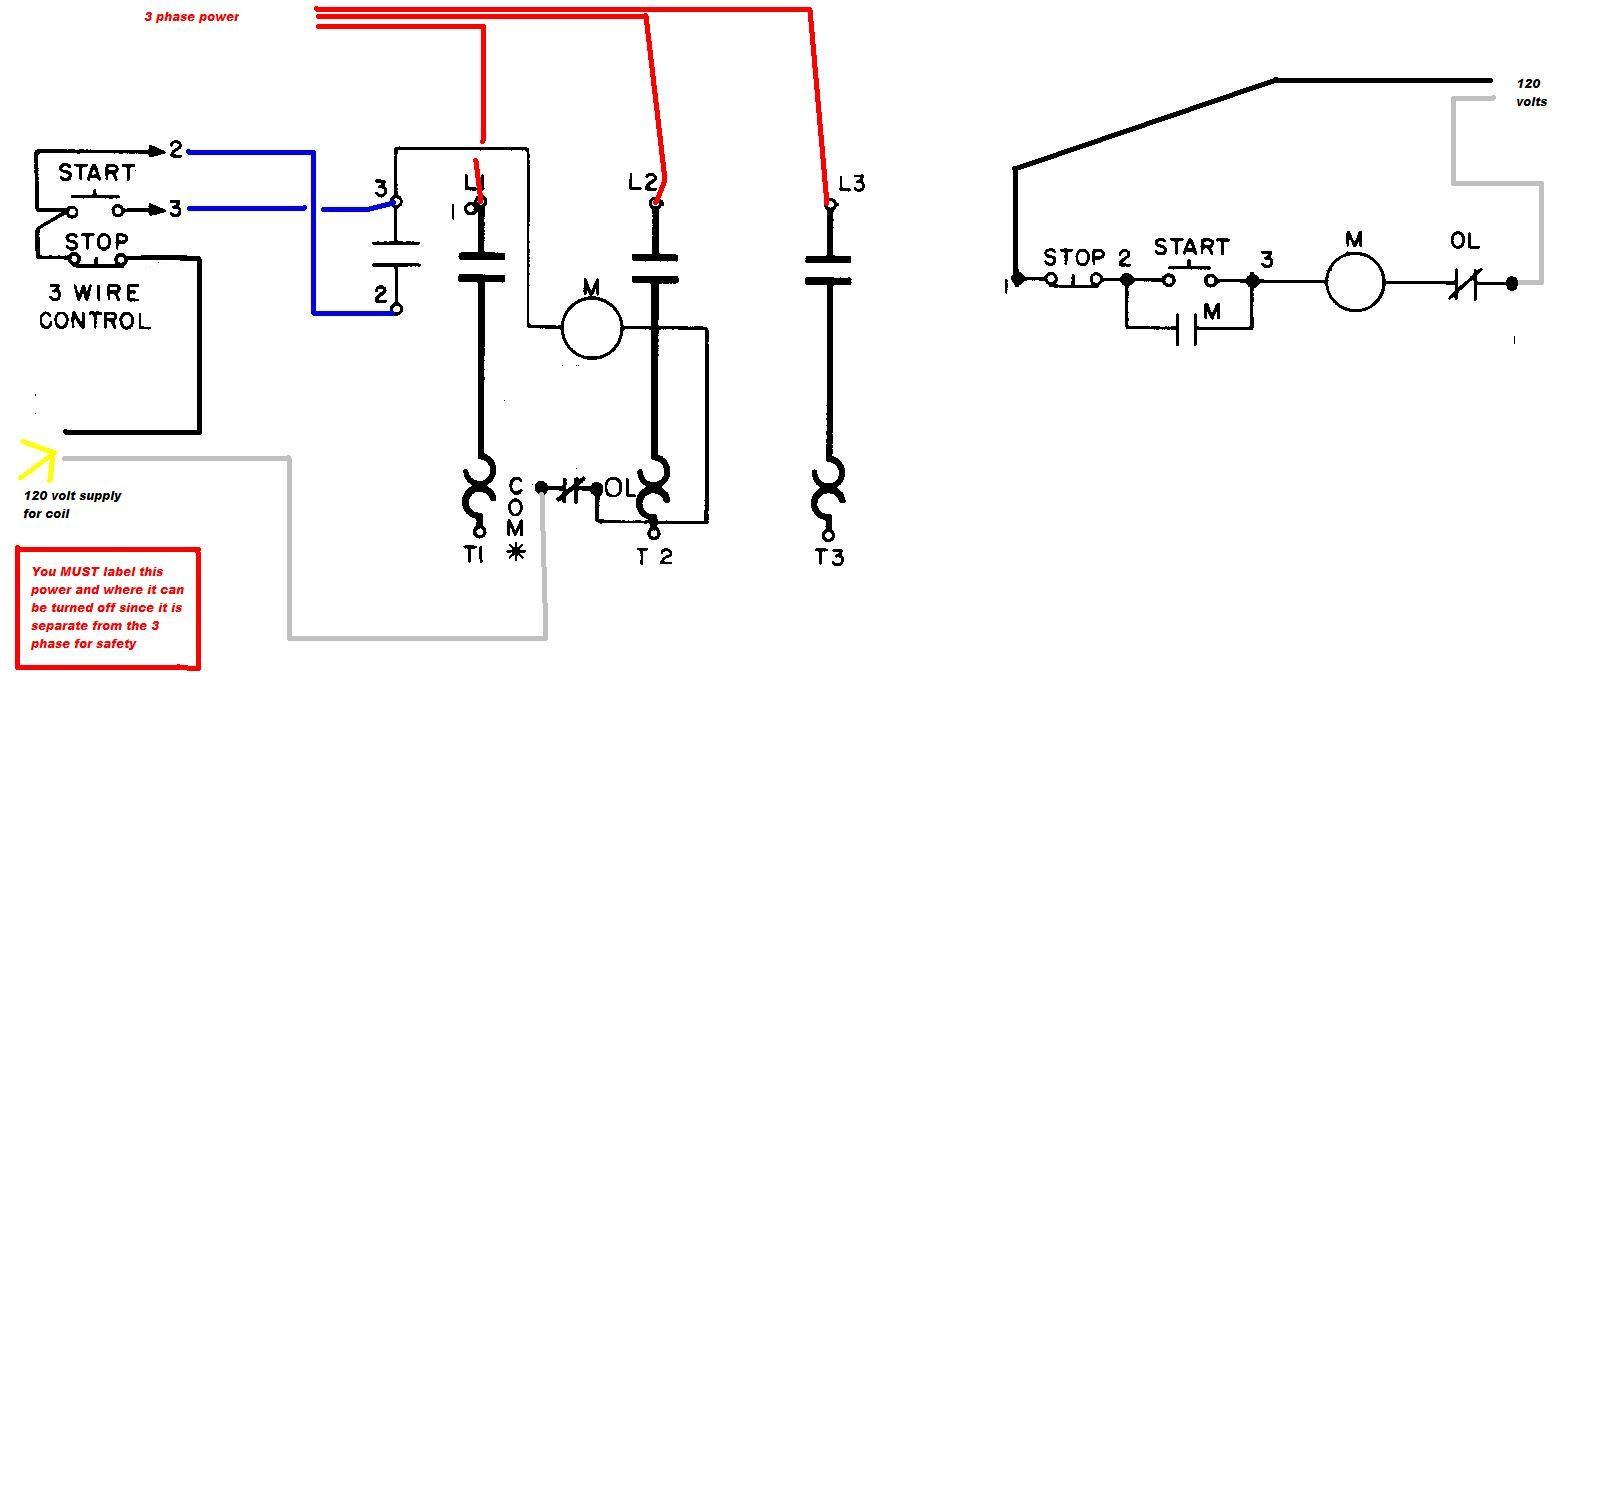 Cutler Hammer Starter Wiring Diagram Motor Starter Circuit Diagram Wiring Diagram Ponents Of Cutler Hammer Starter Wiring Diagram